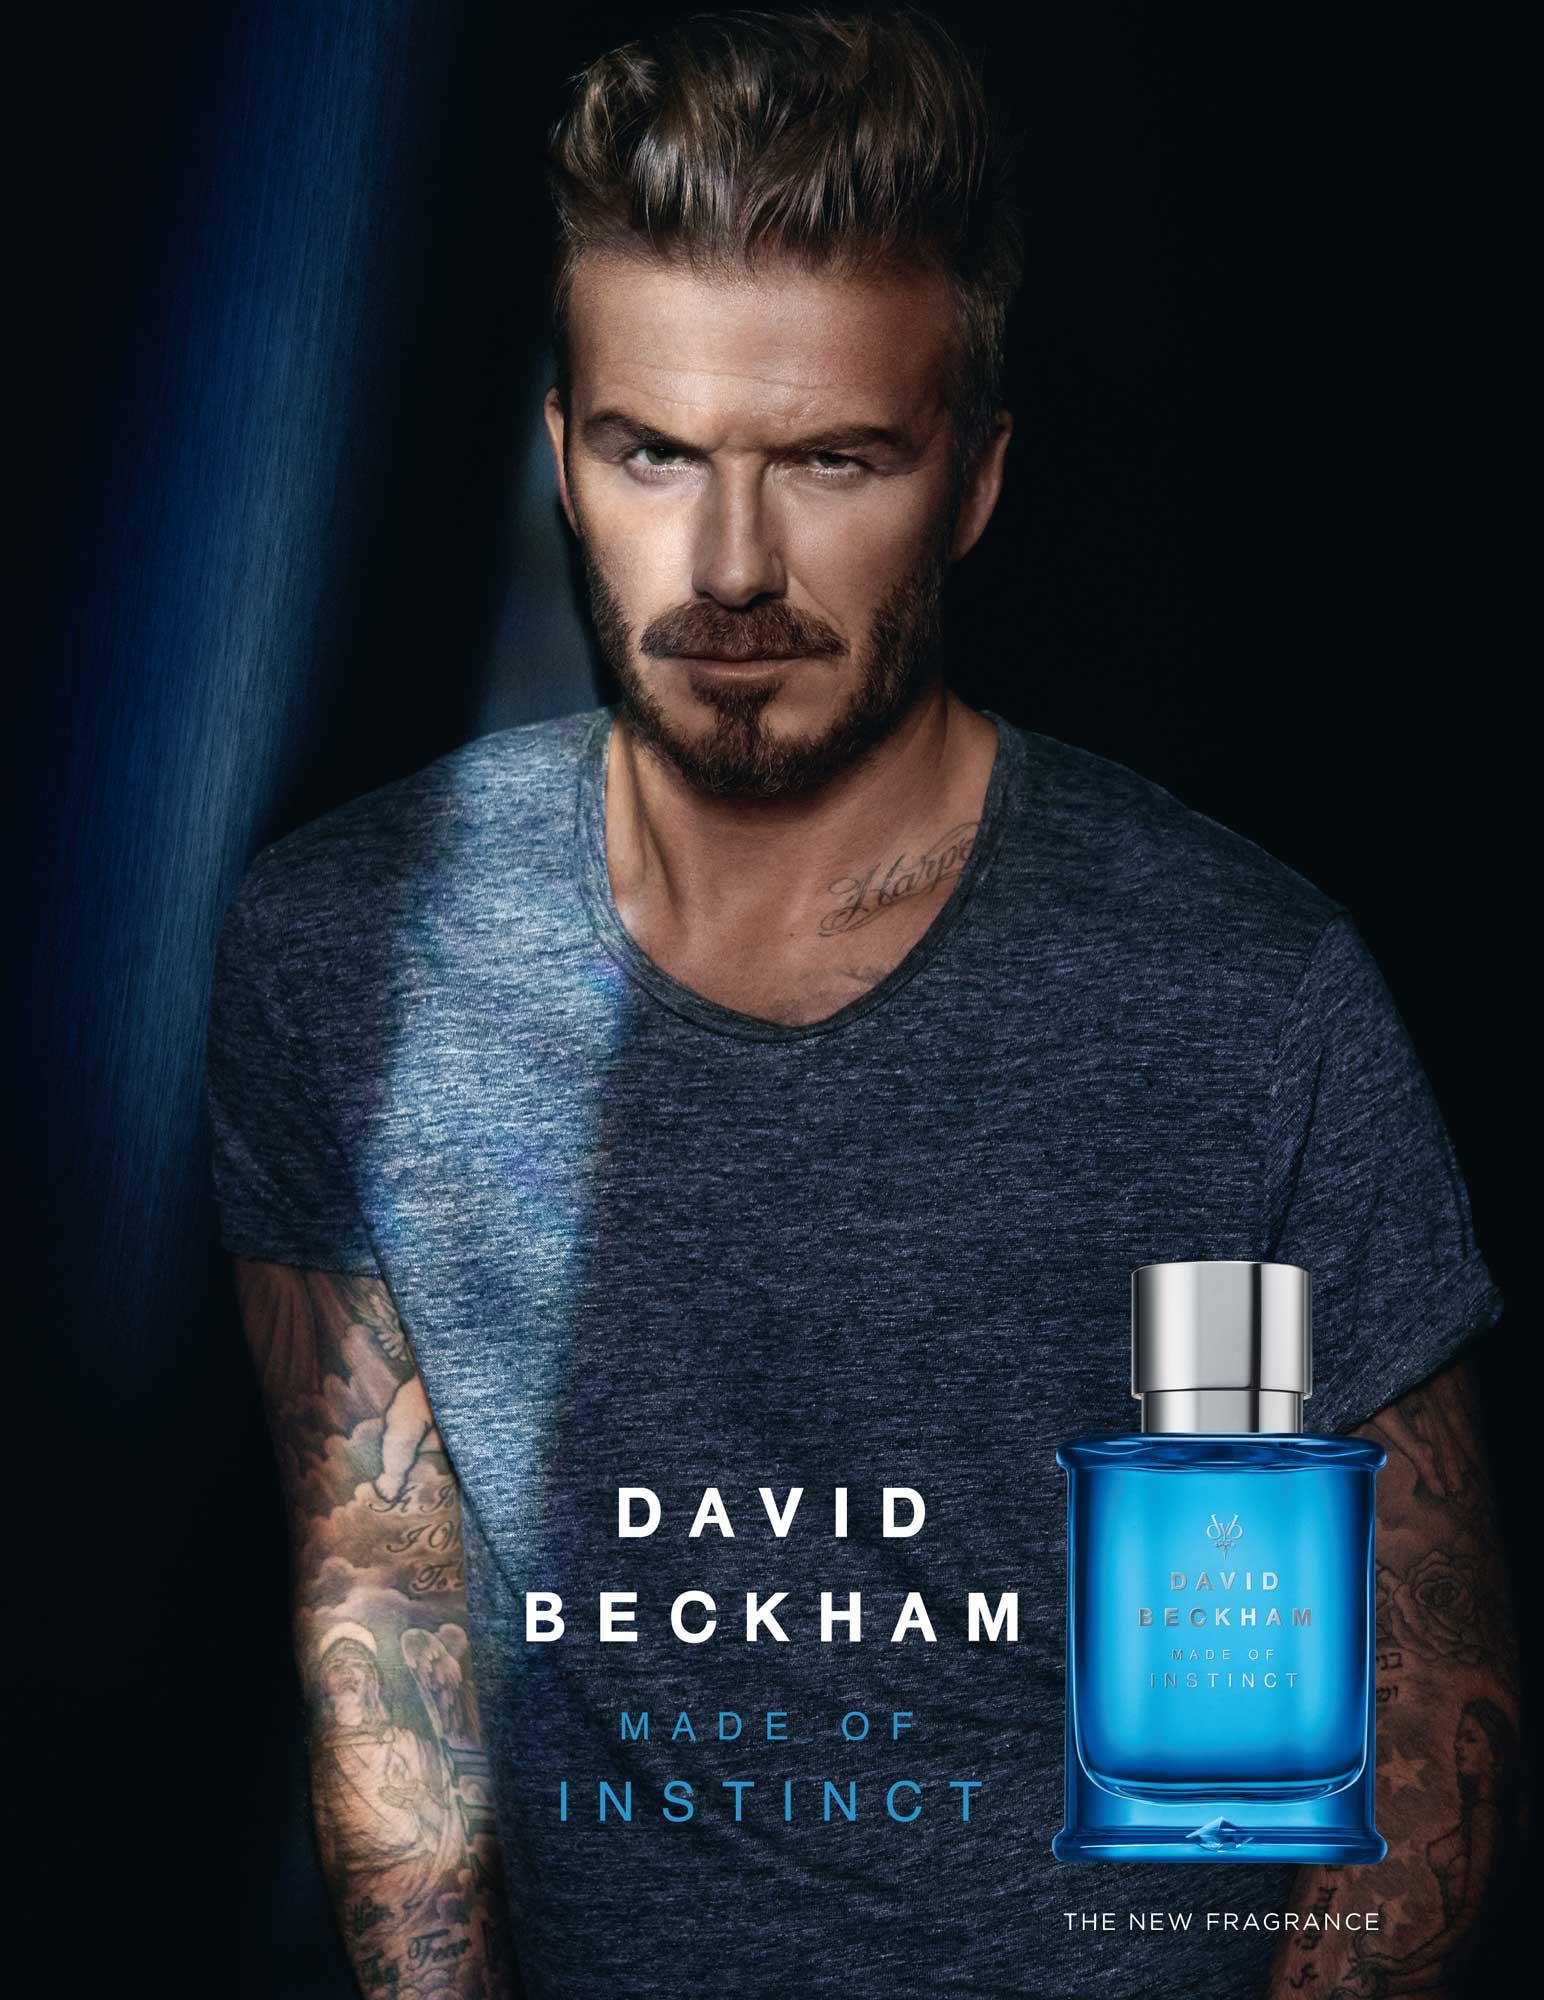 Made of Instinct David Beckham cologne - a new fragrance for